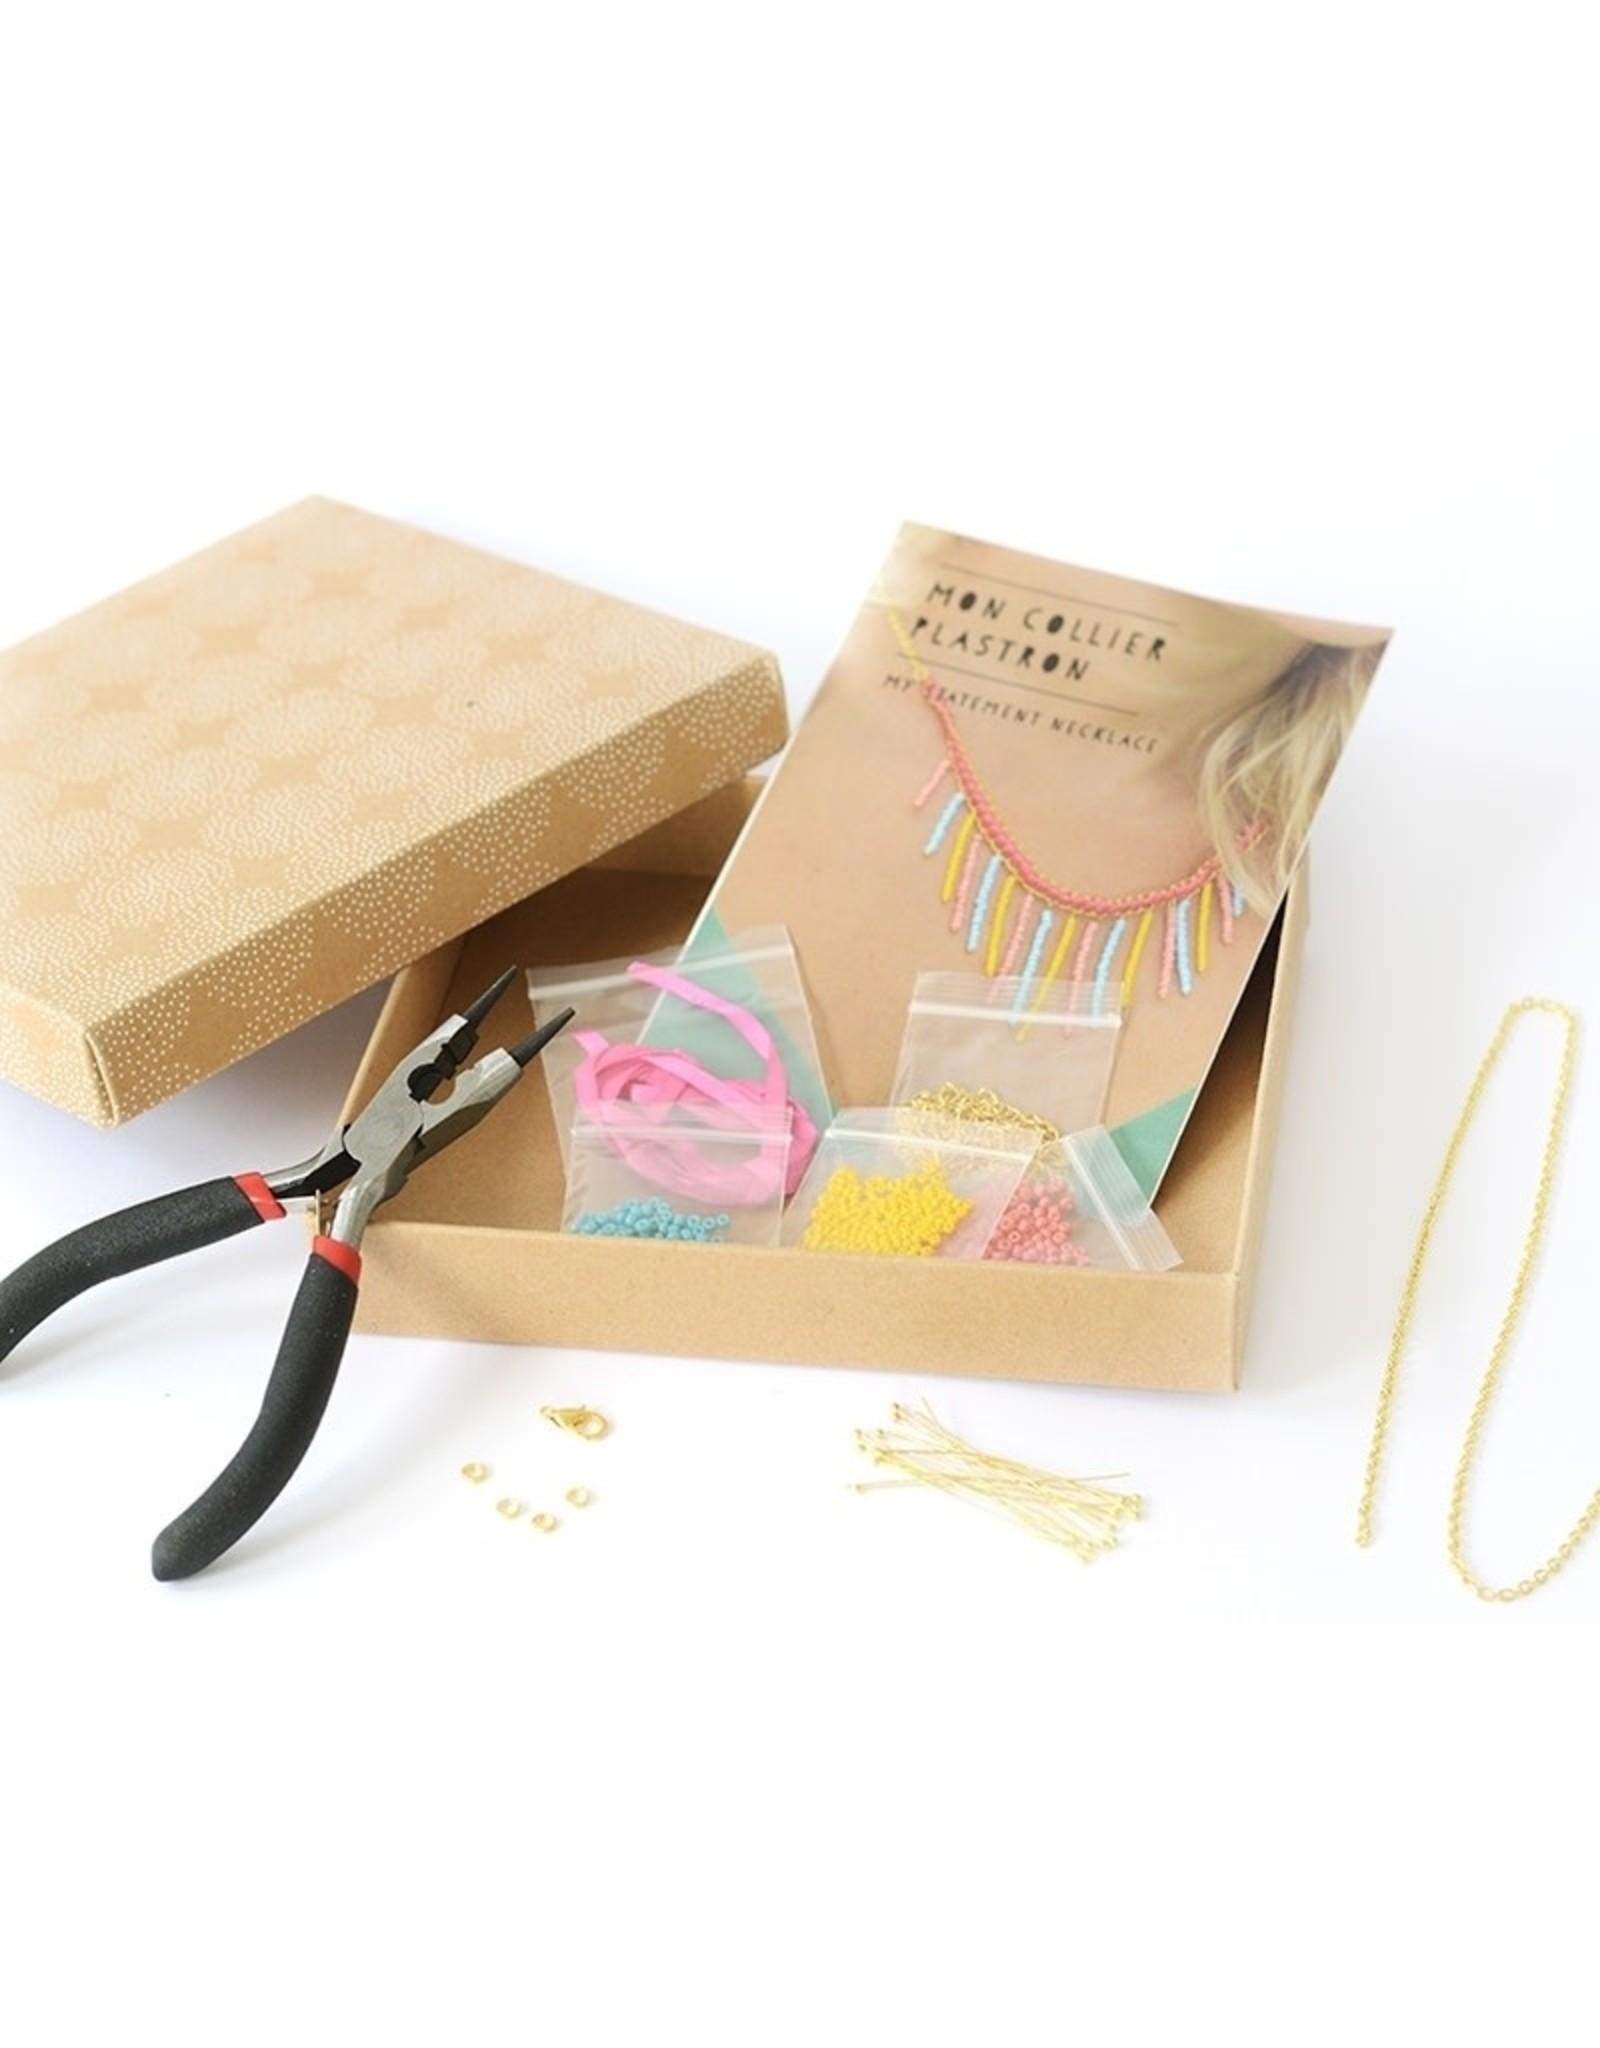 La petite épicerie DIY kit Ketting das